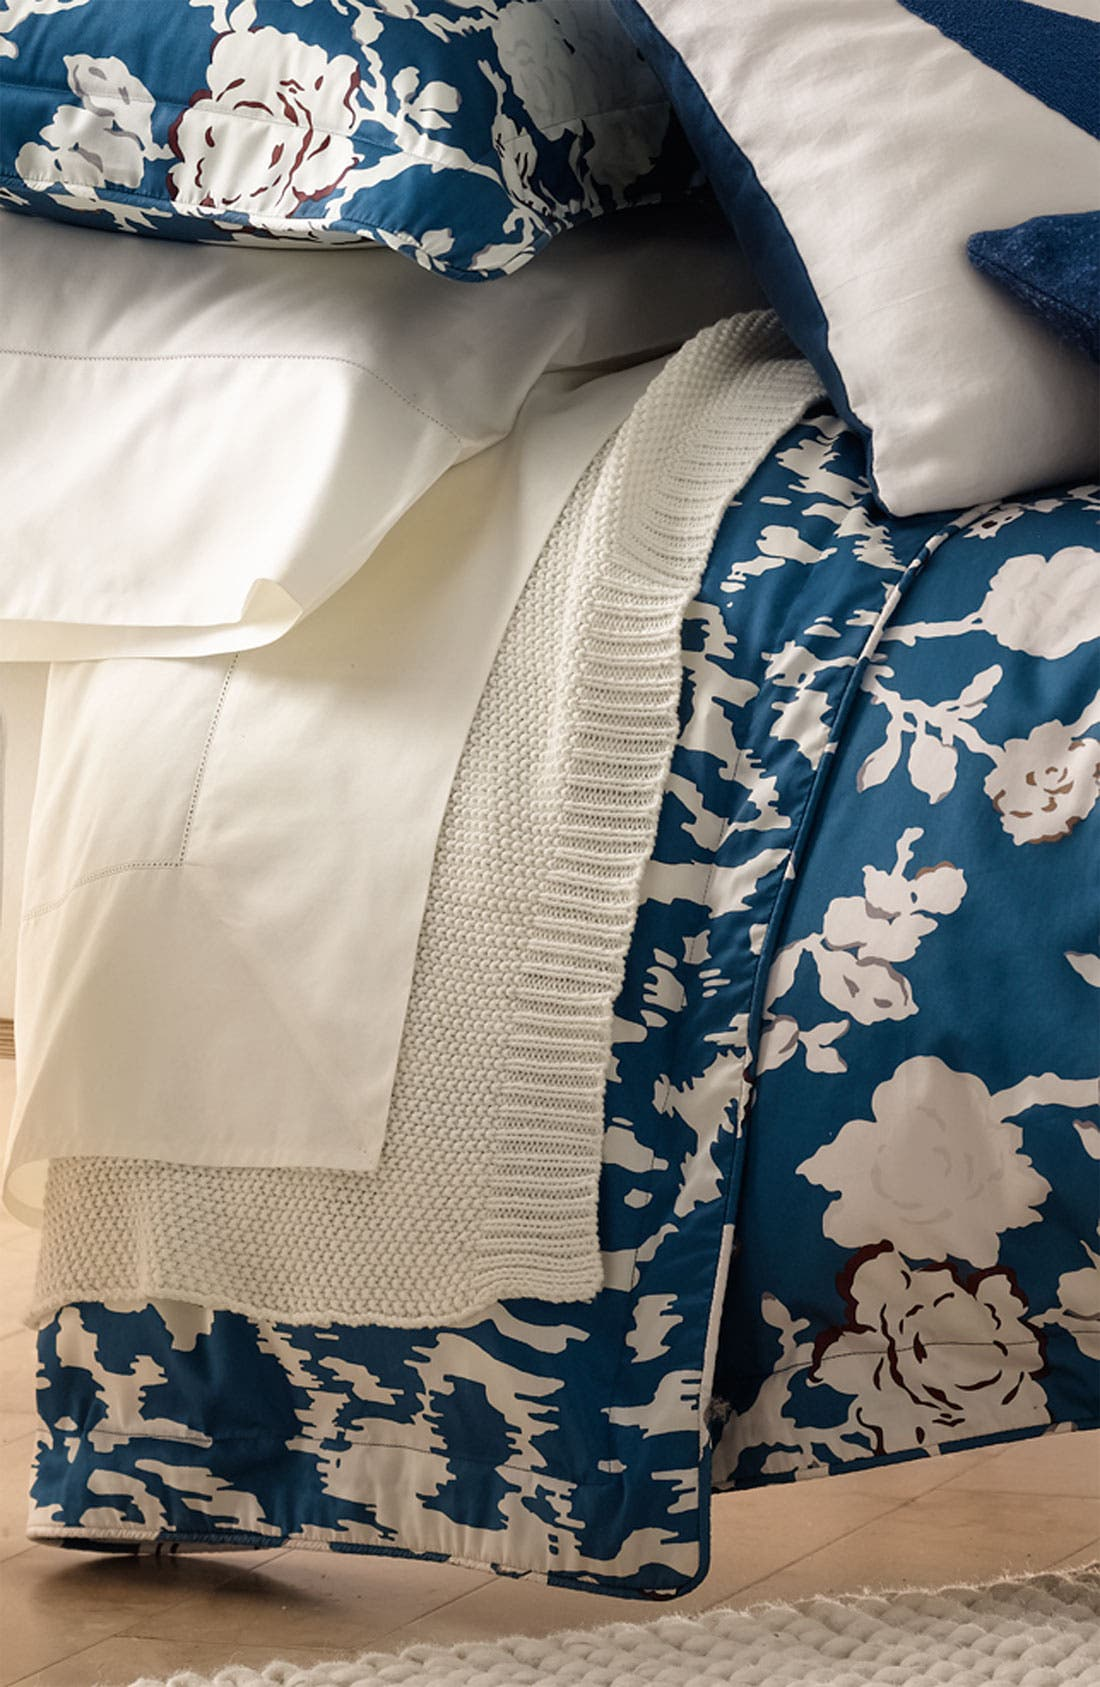 Main Image - Diane von Furstenberg 'China Vine' 300 Thread Count Duvet Cover